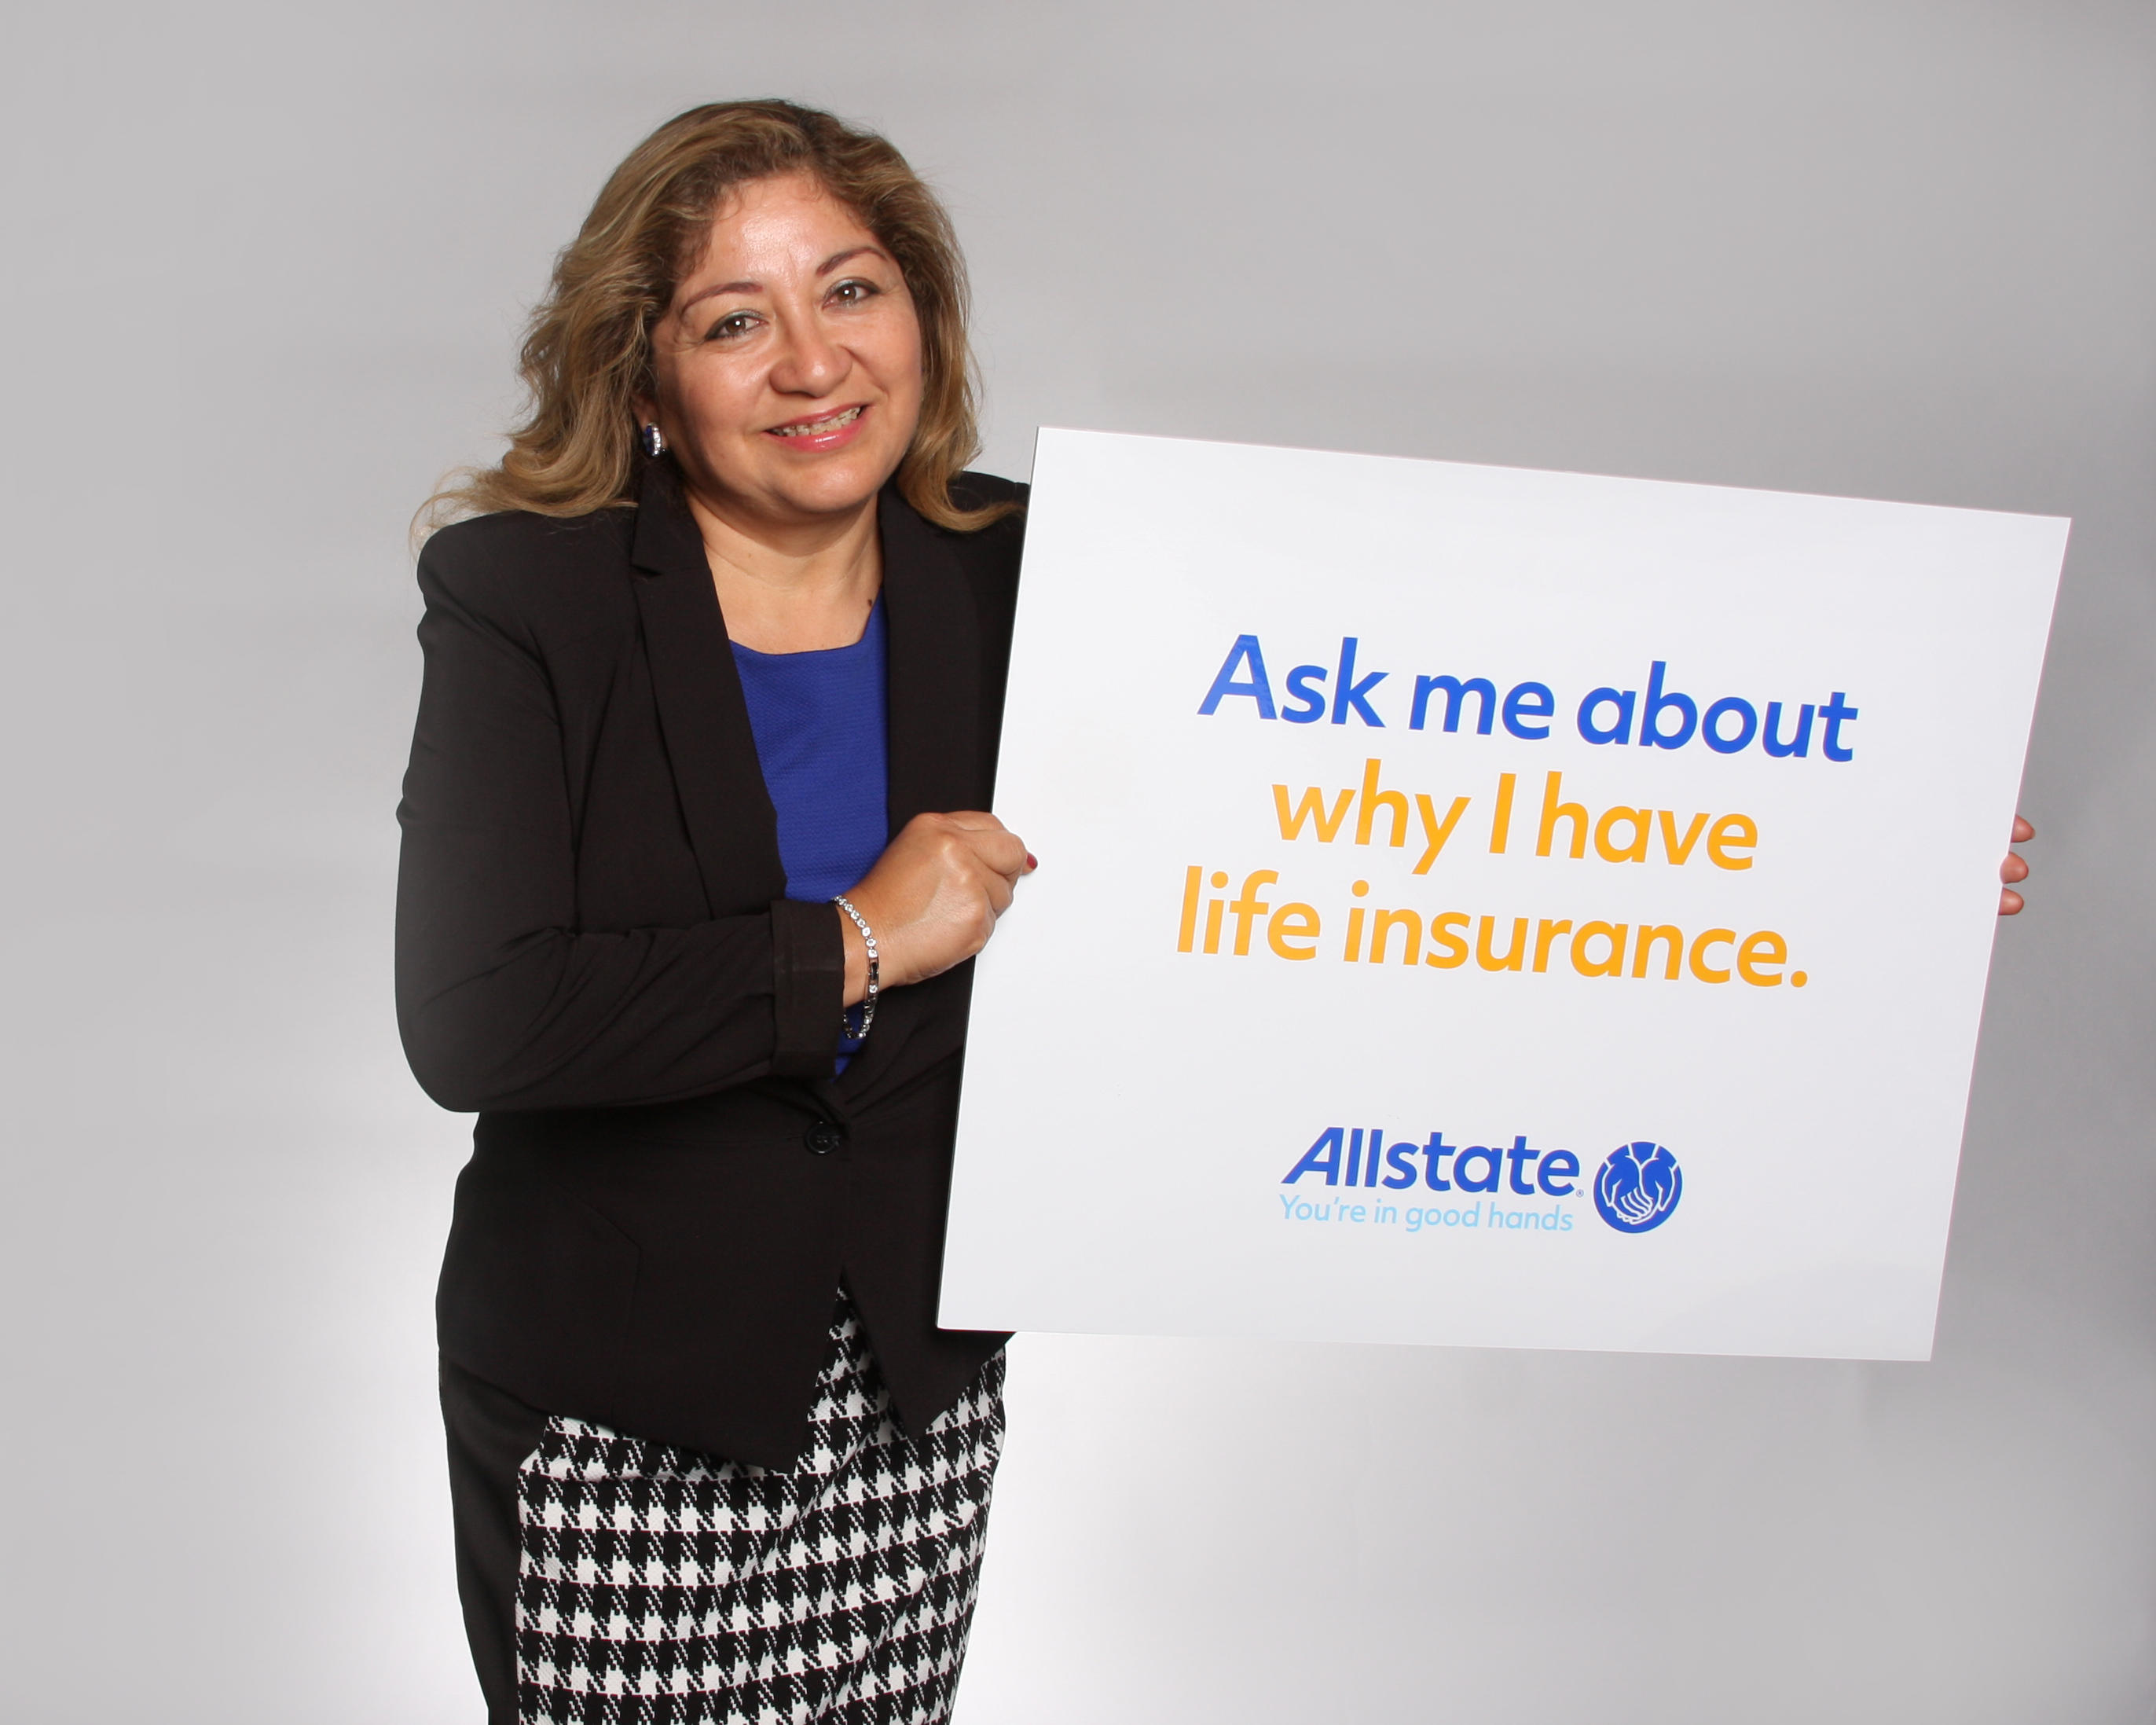 Maria Amaya: Allstate Insurance image 7